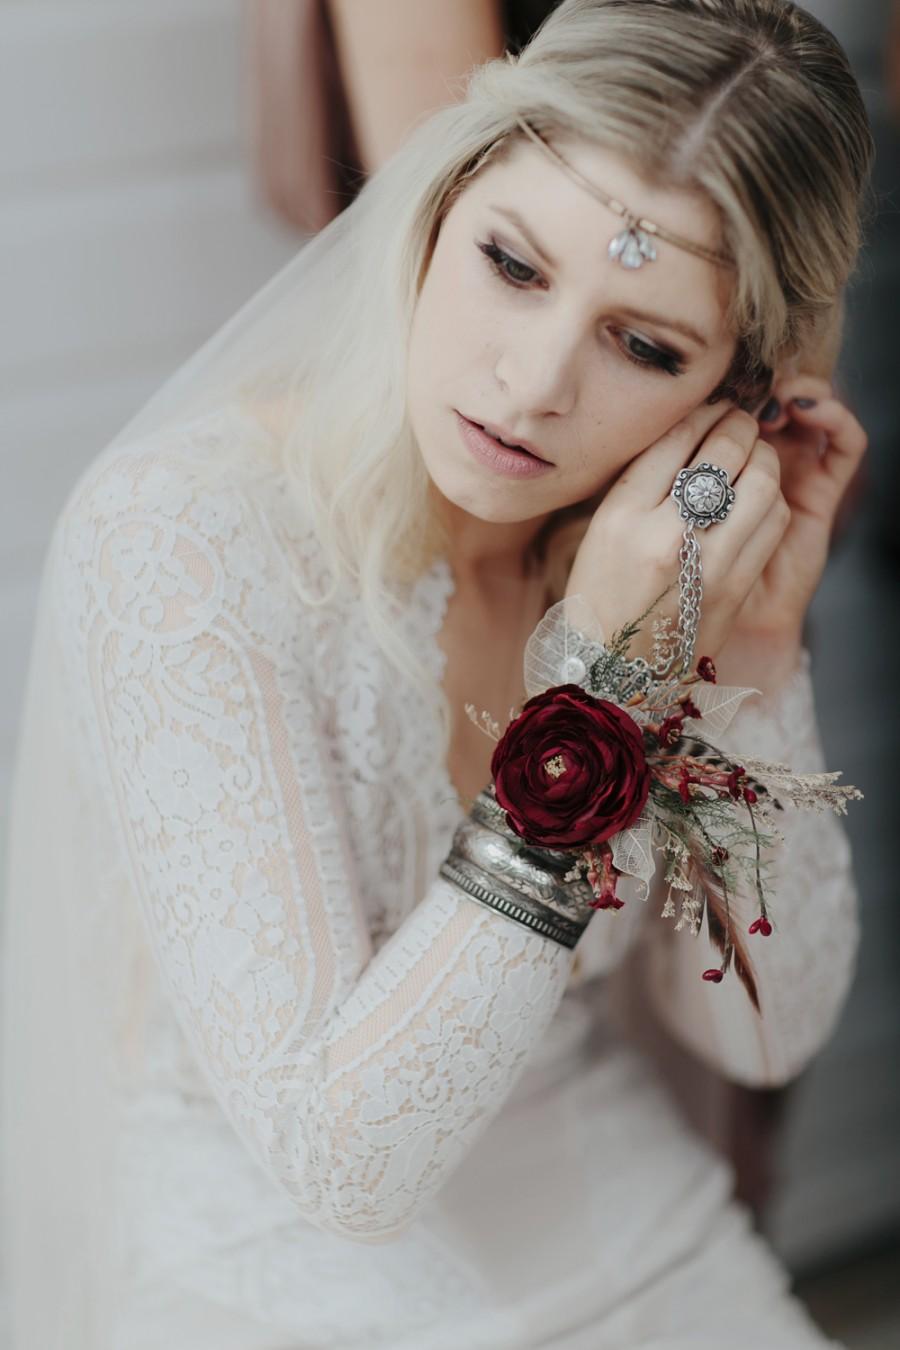 boho-tipi-wedding-sheraton-port-douglas-oli-sansom-10-900x0-c-default.jpg